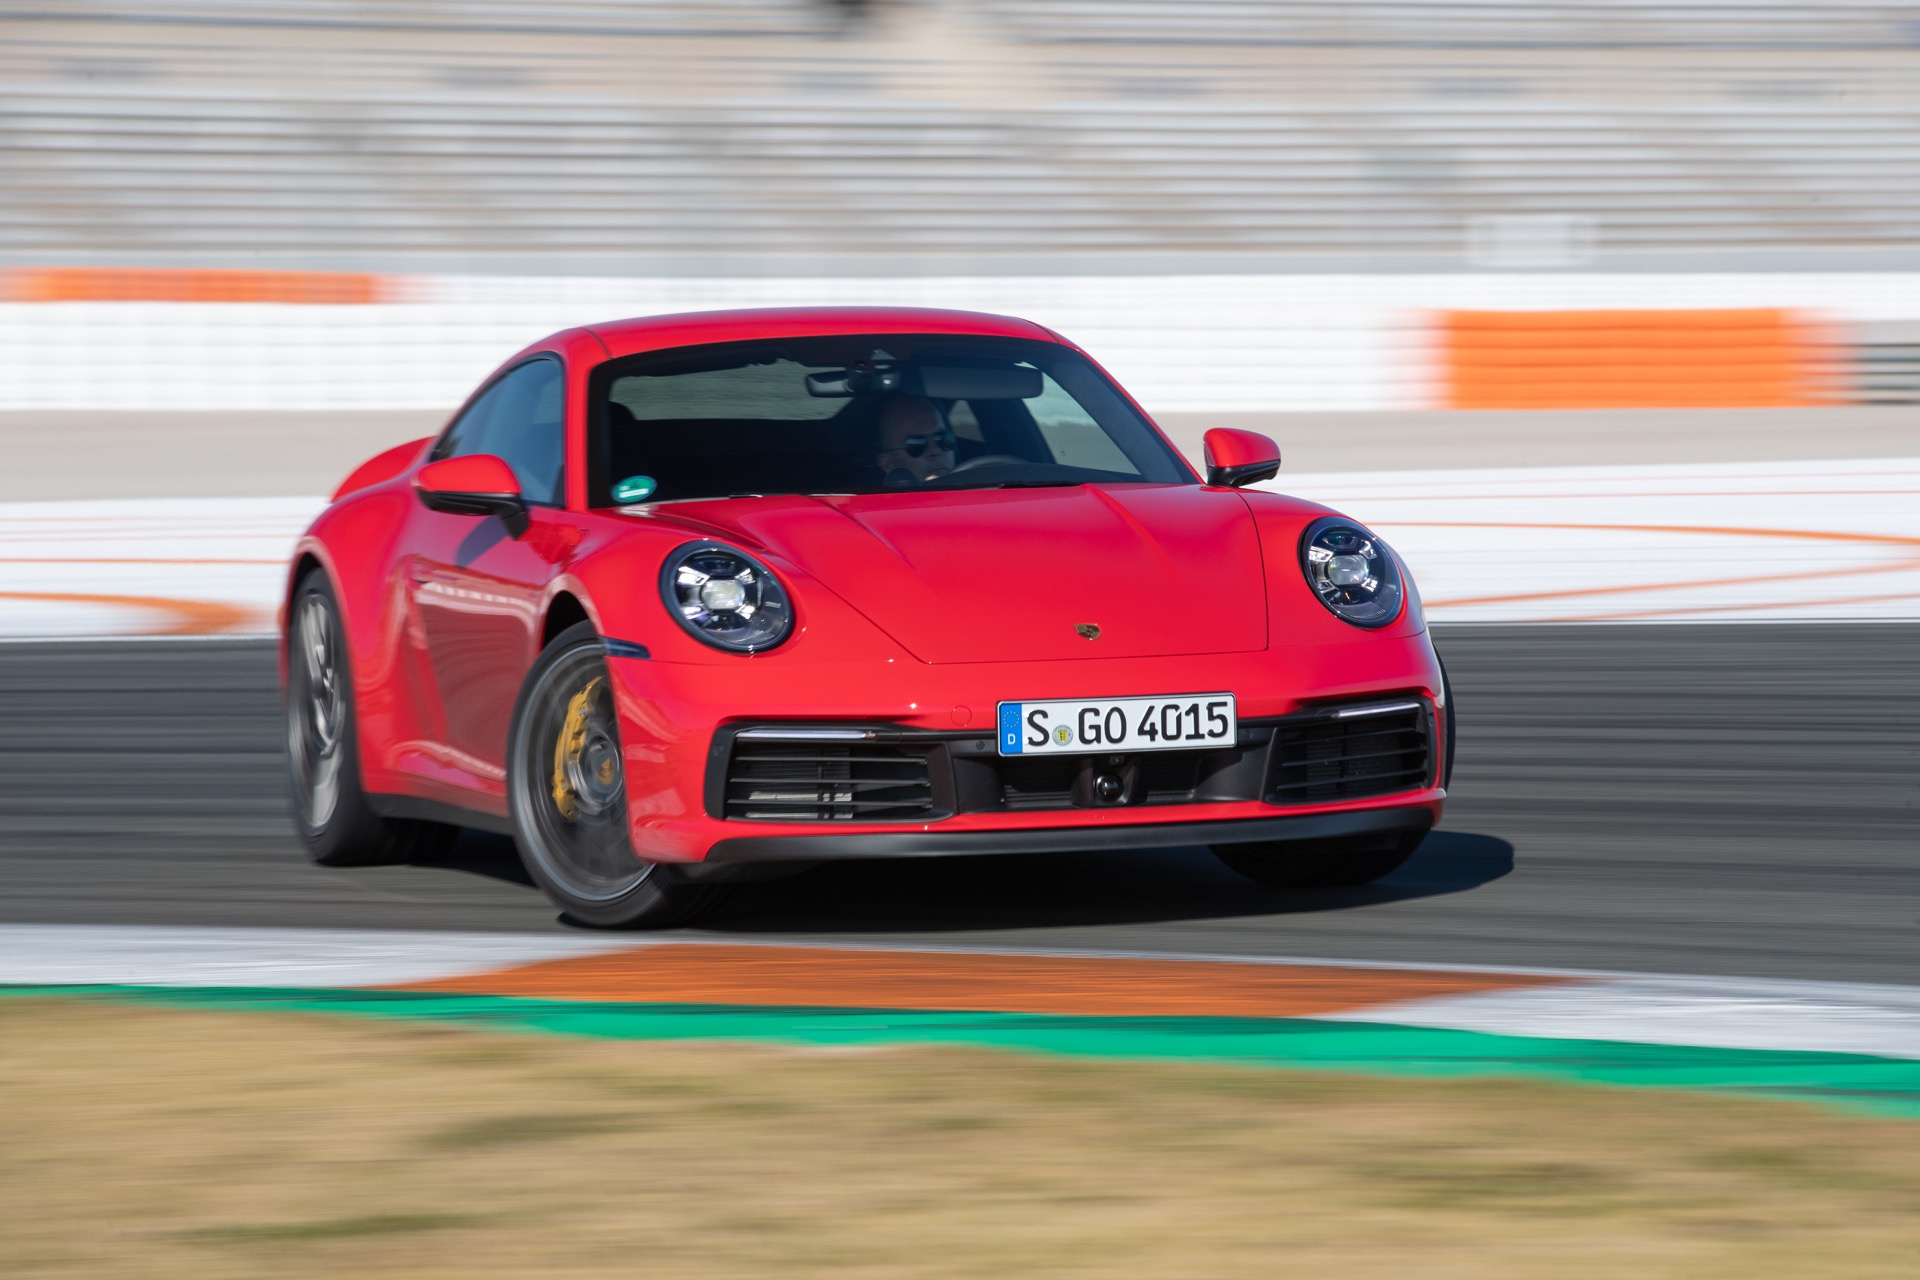 Porsche 911 992 Carrera S 00007